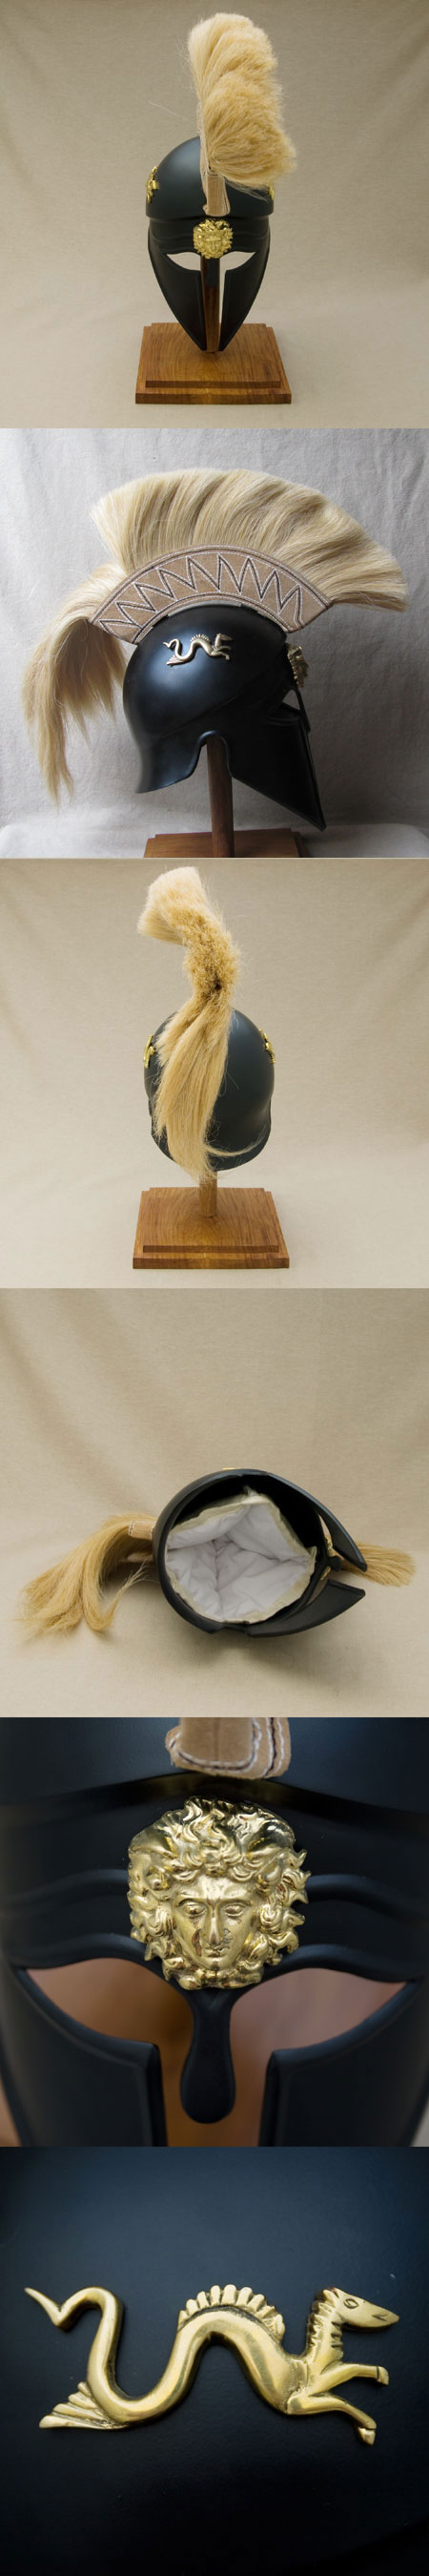 Cabeza para poner los auriculares. AH6058R2-greek-corinthian-helmet-w-beige-plume,abt-500-b-c-